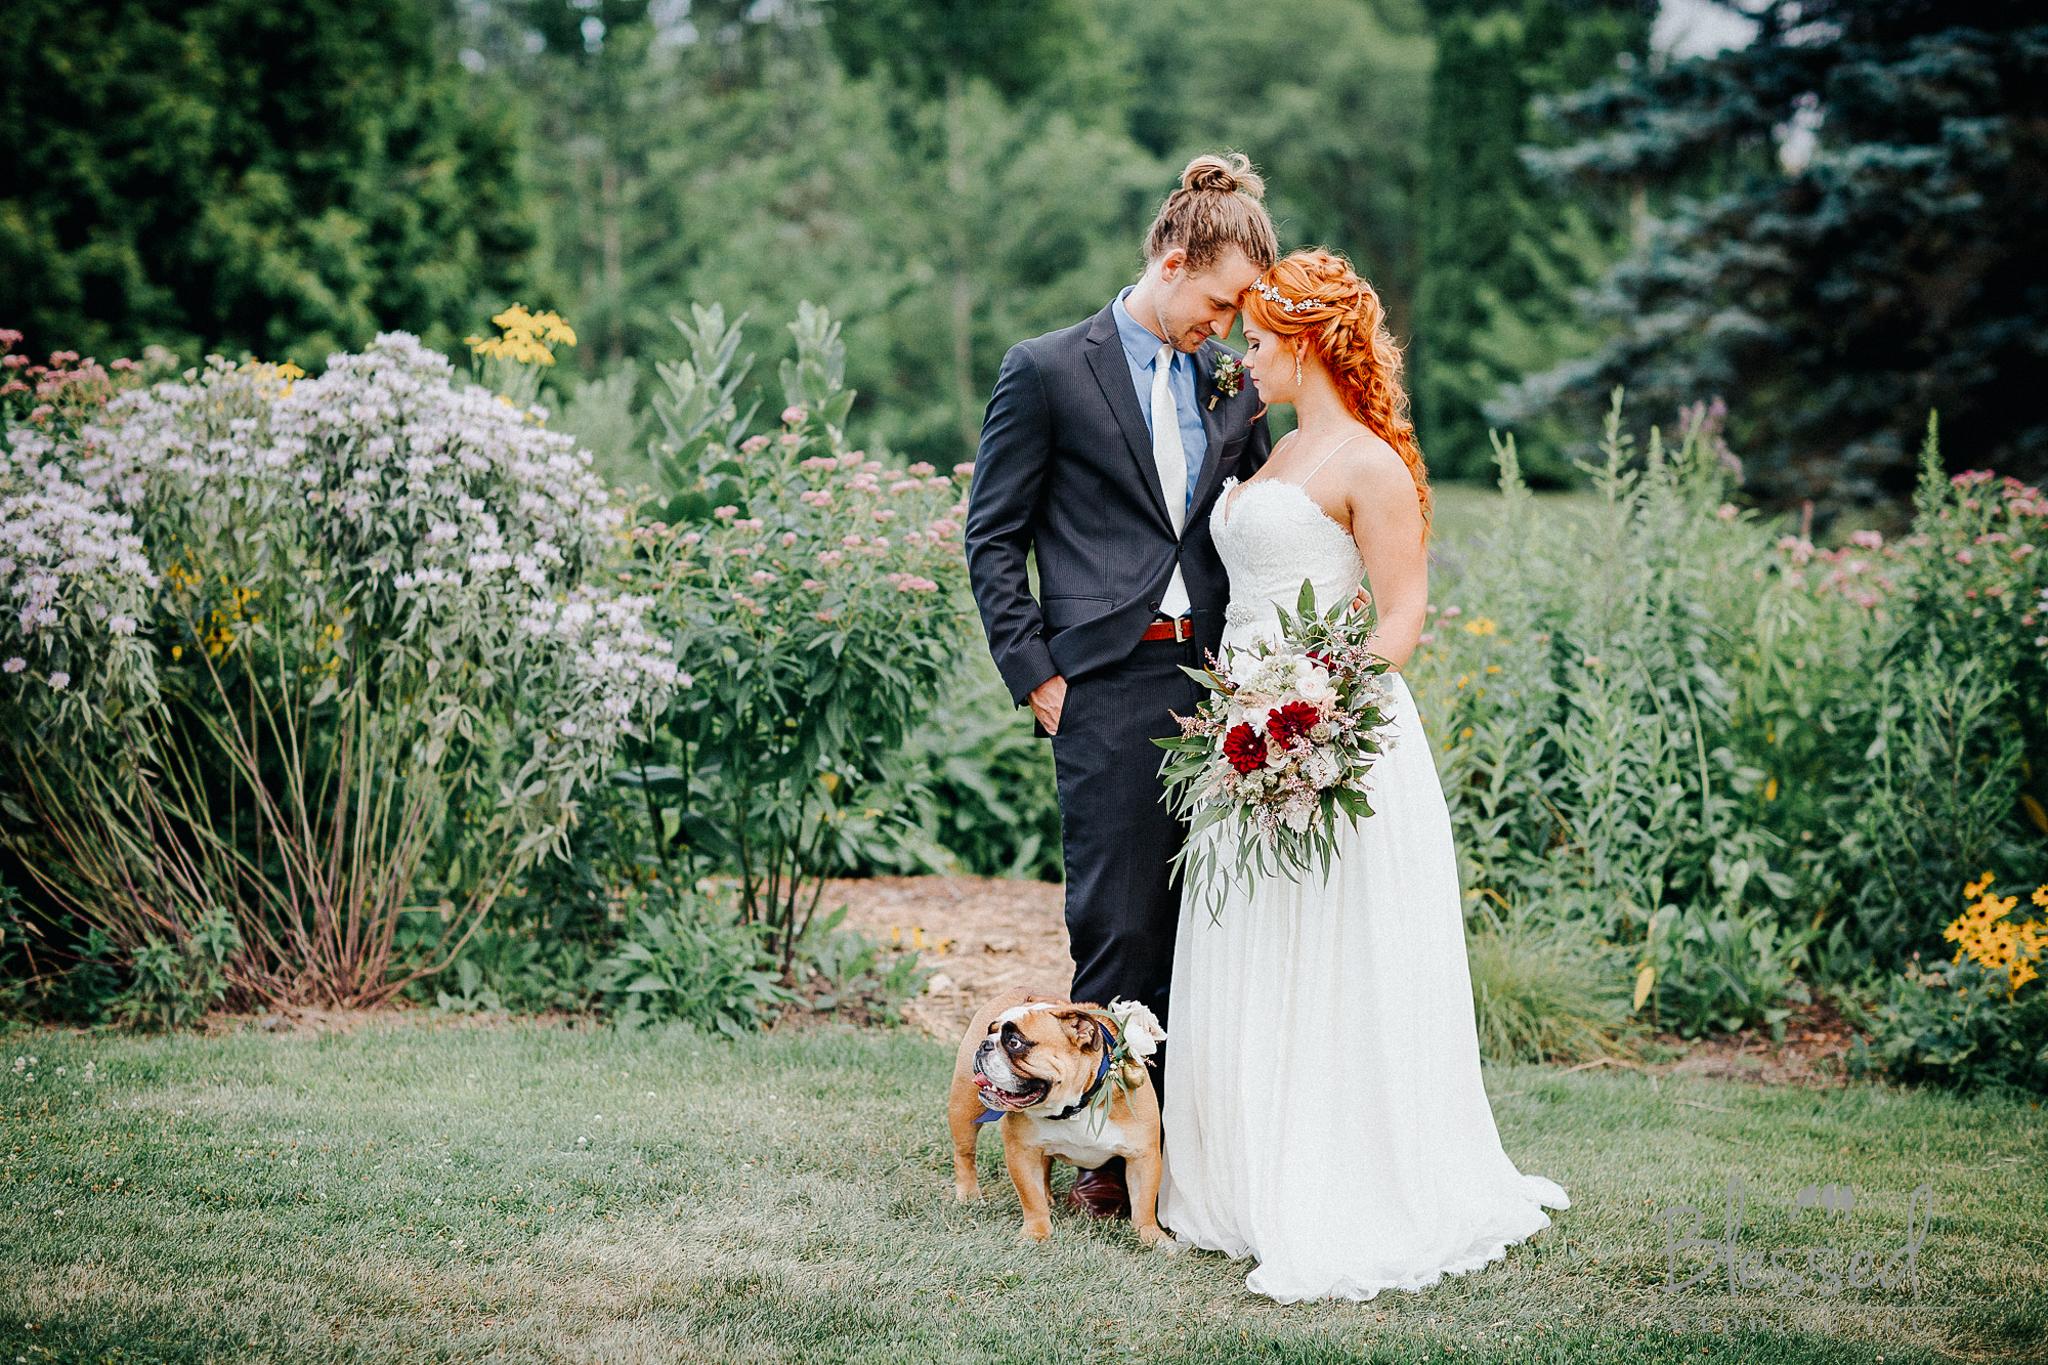 Destination Wedding Photography Minnesota By Blessed Wedding Photographers-30.jpg